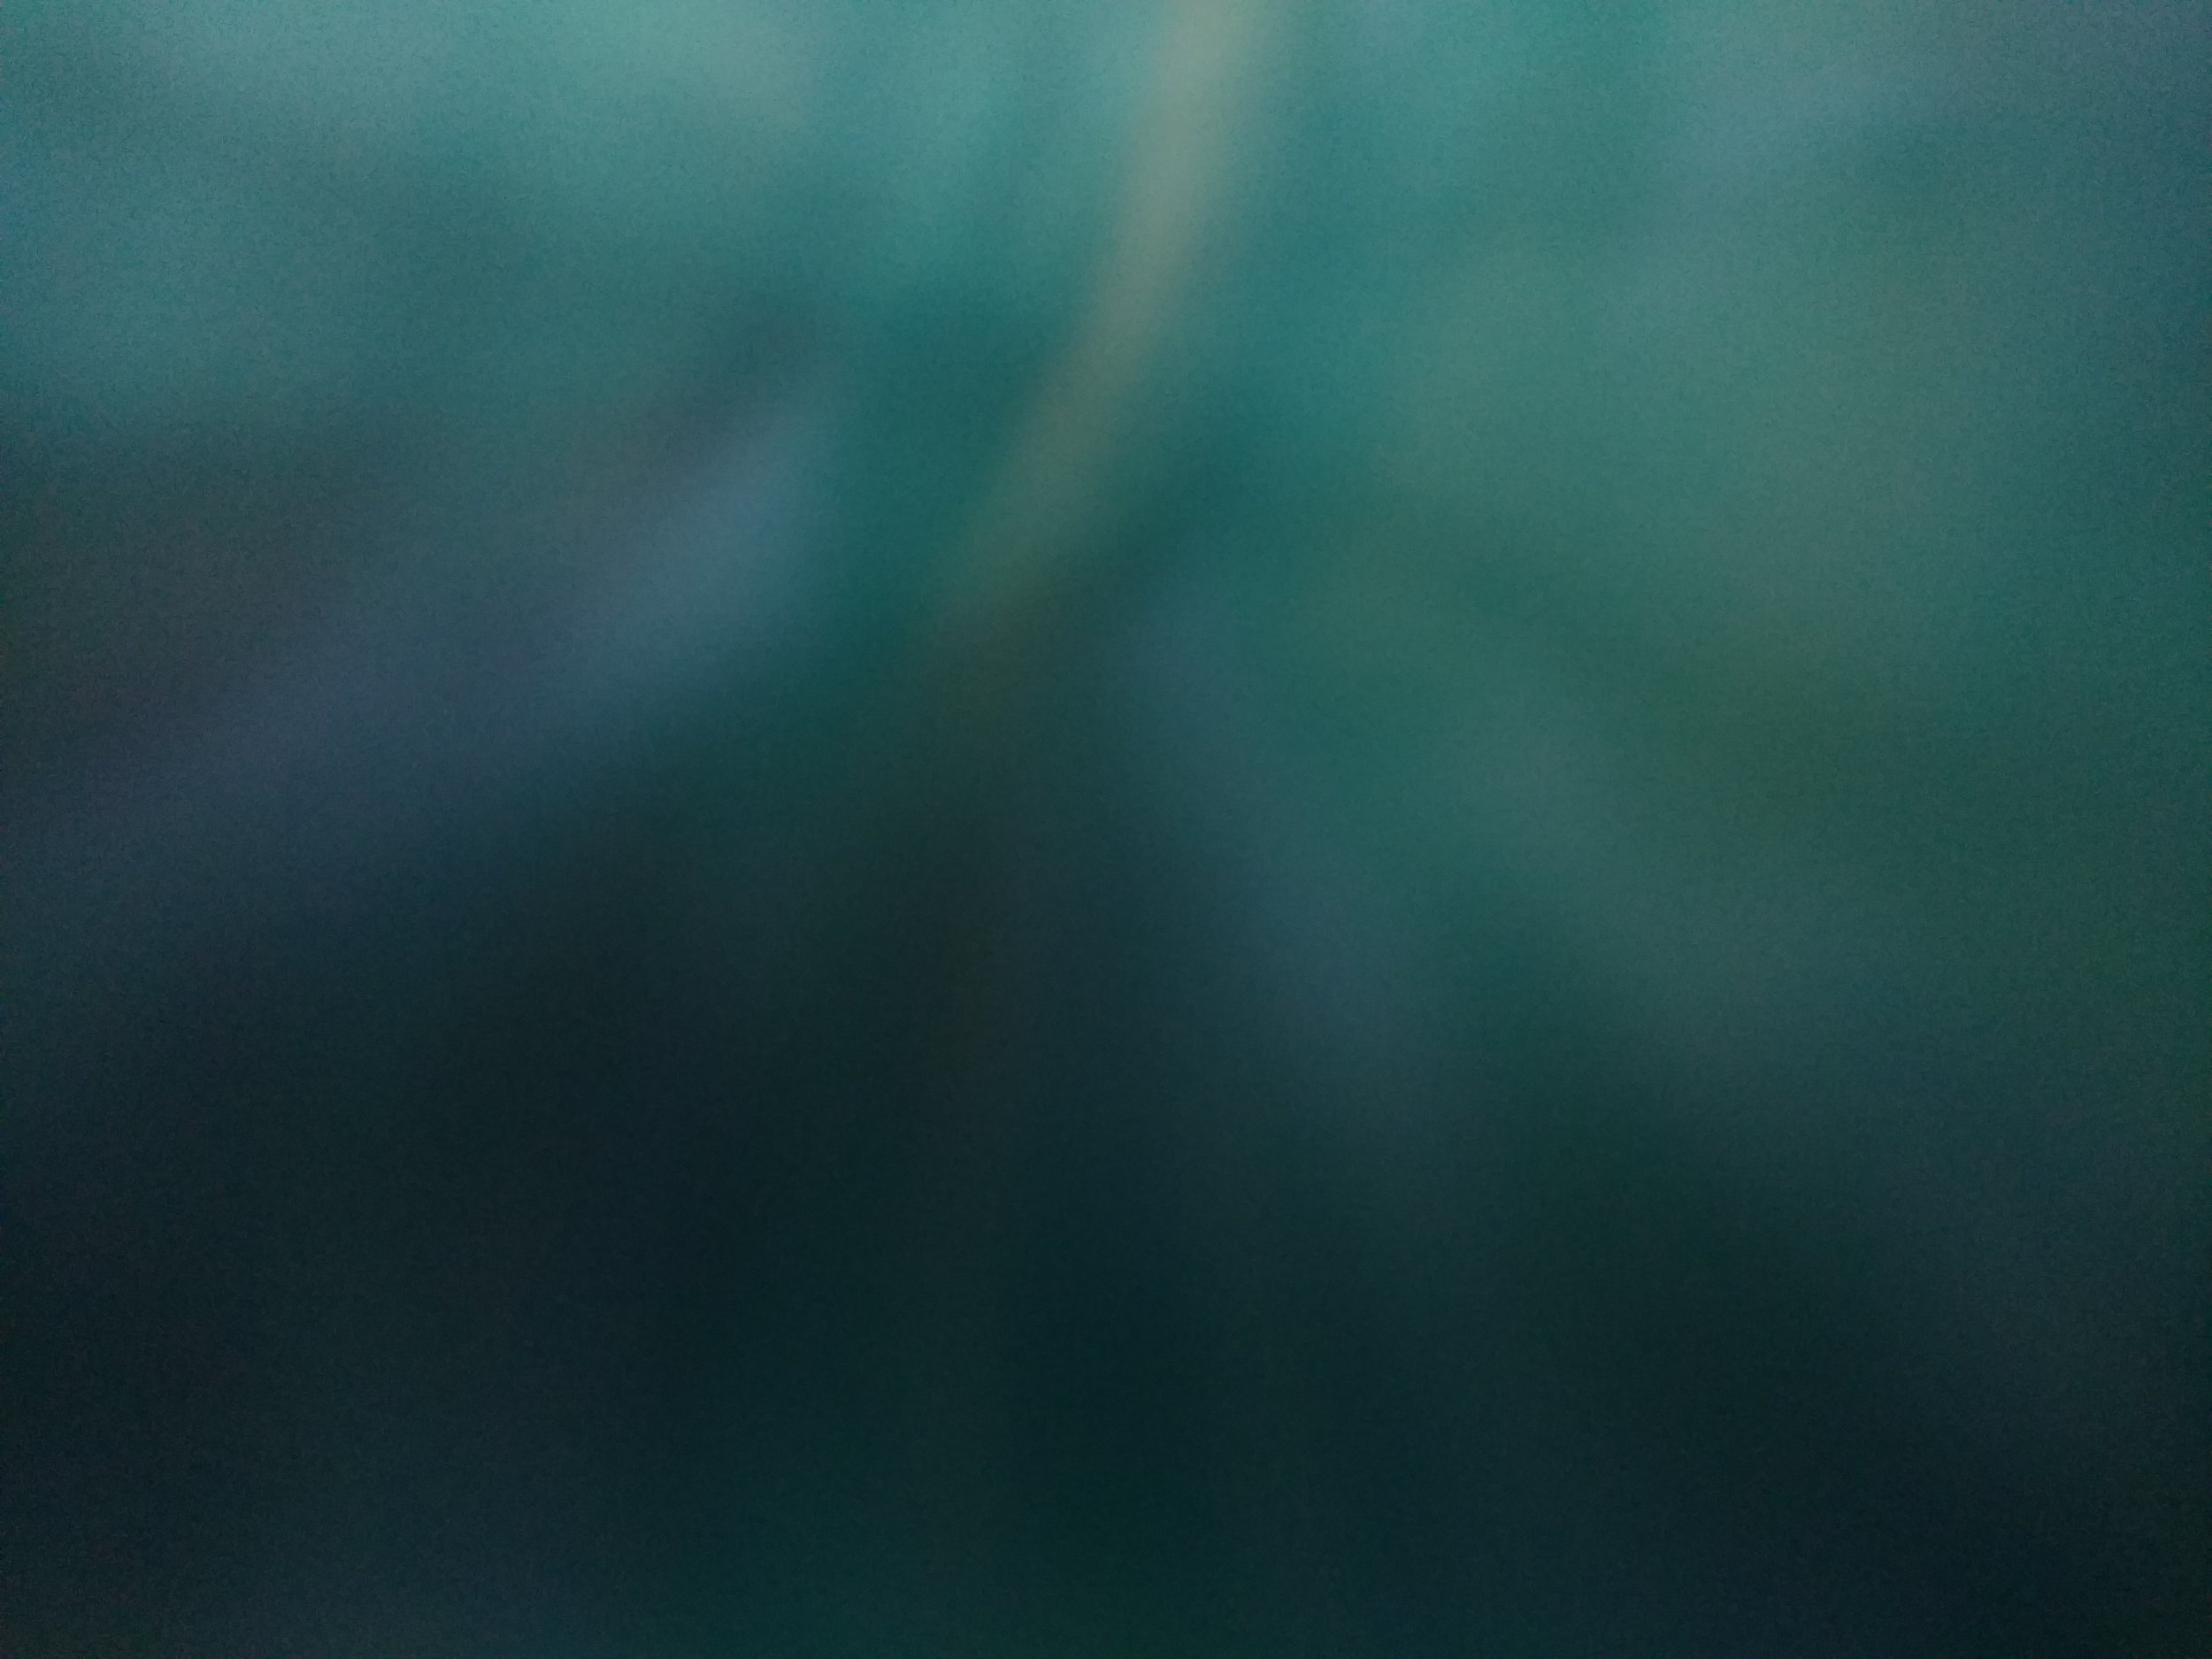 willroth-co-free-texture-gradient-061.jpg